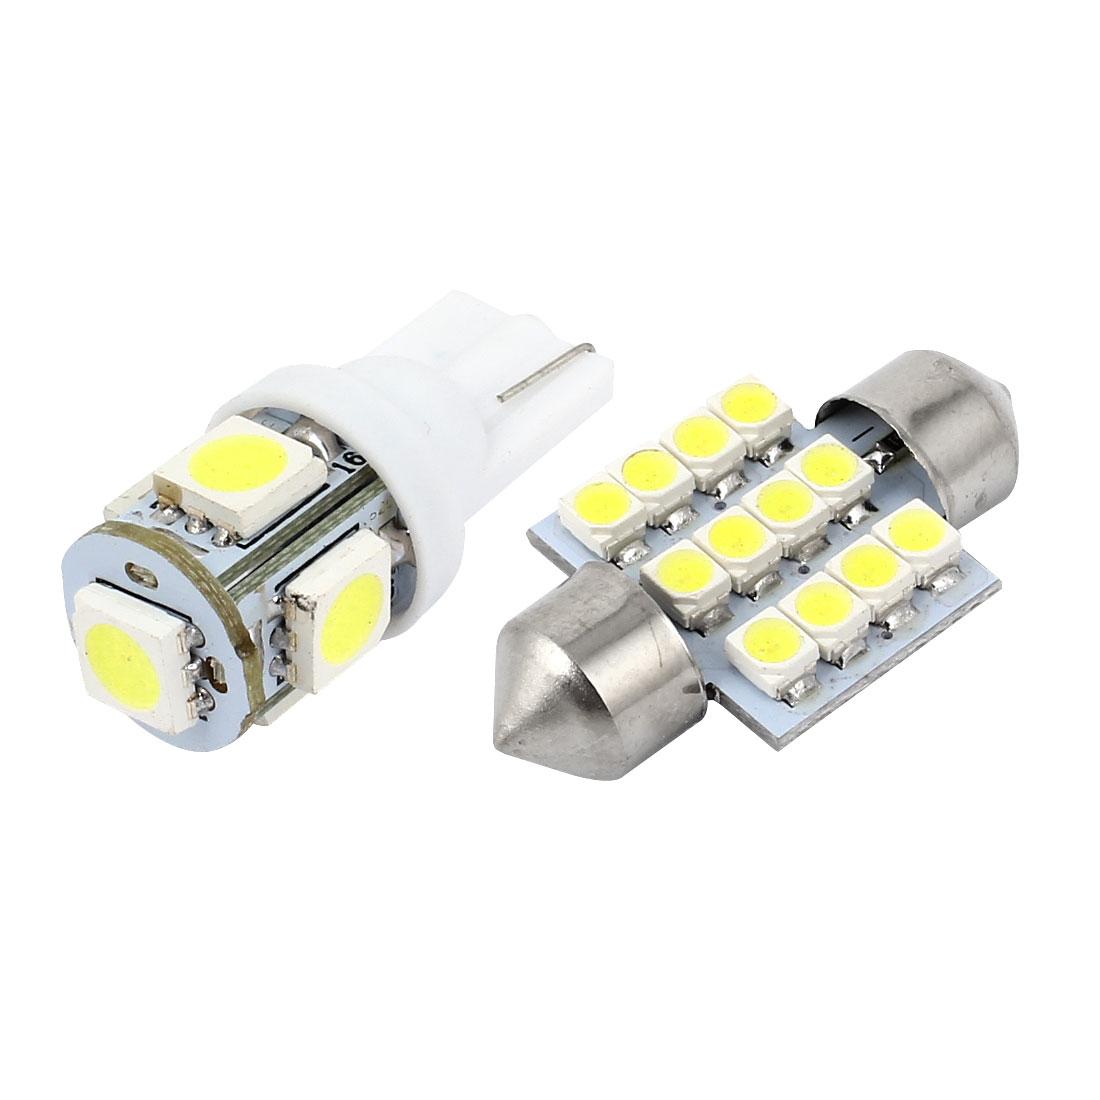 10 Pcs White LED T10 Festoon Light Interior Package Kit for Infiniti QX56 QX80